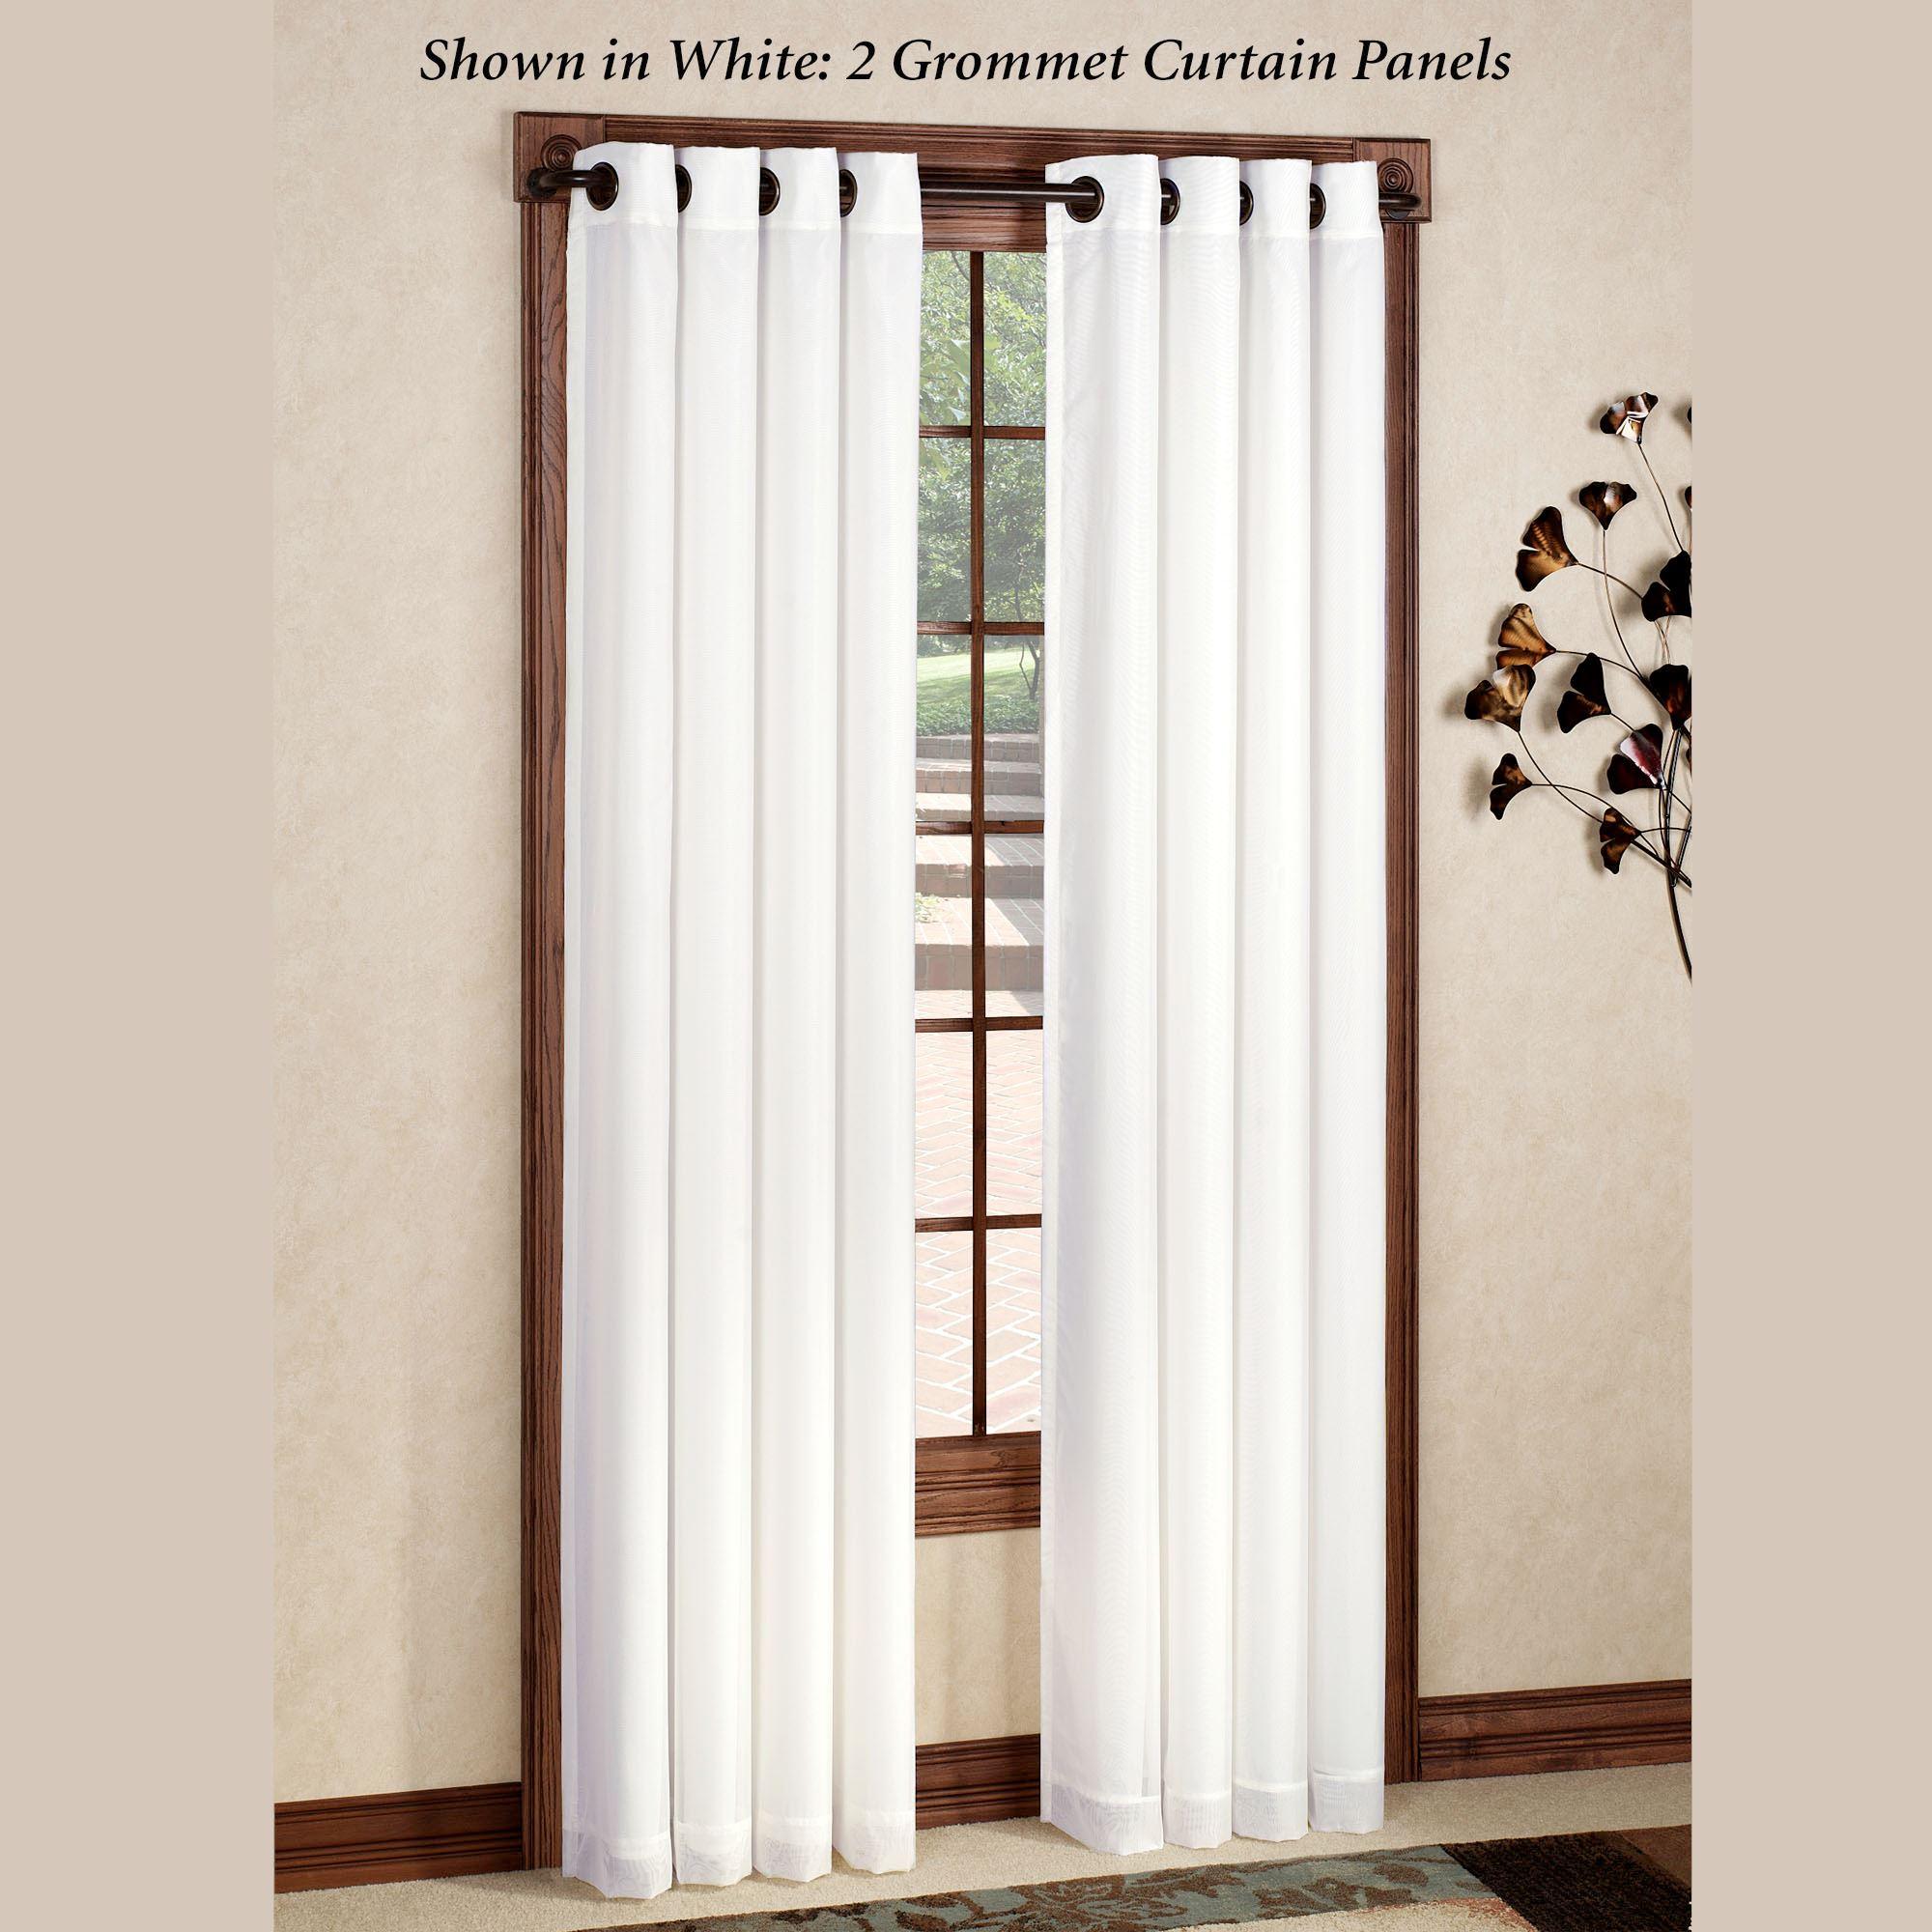 Rhapsody Thermavoile(Tm) Grommet Curtain Panels with regard to Grommet Curtain Panels (Image 16 of 20)